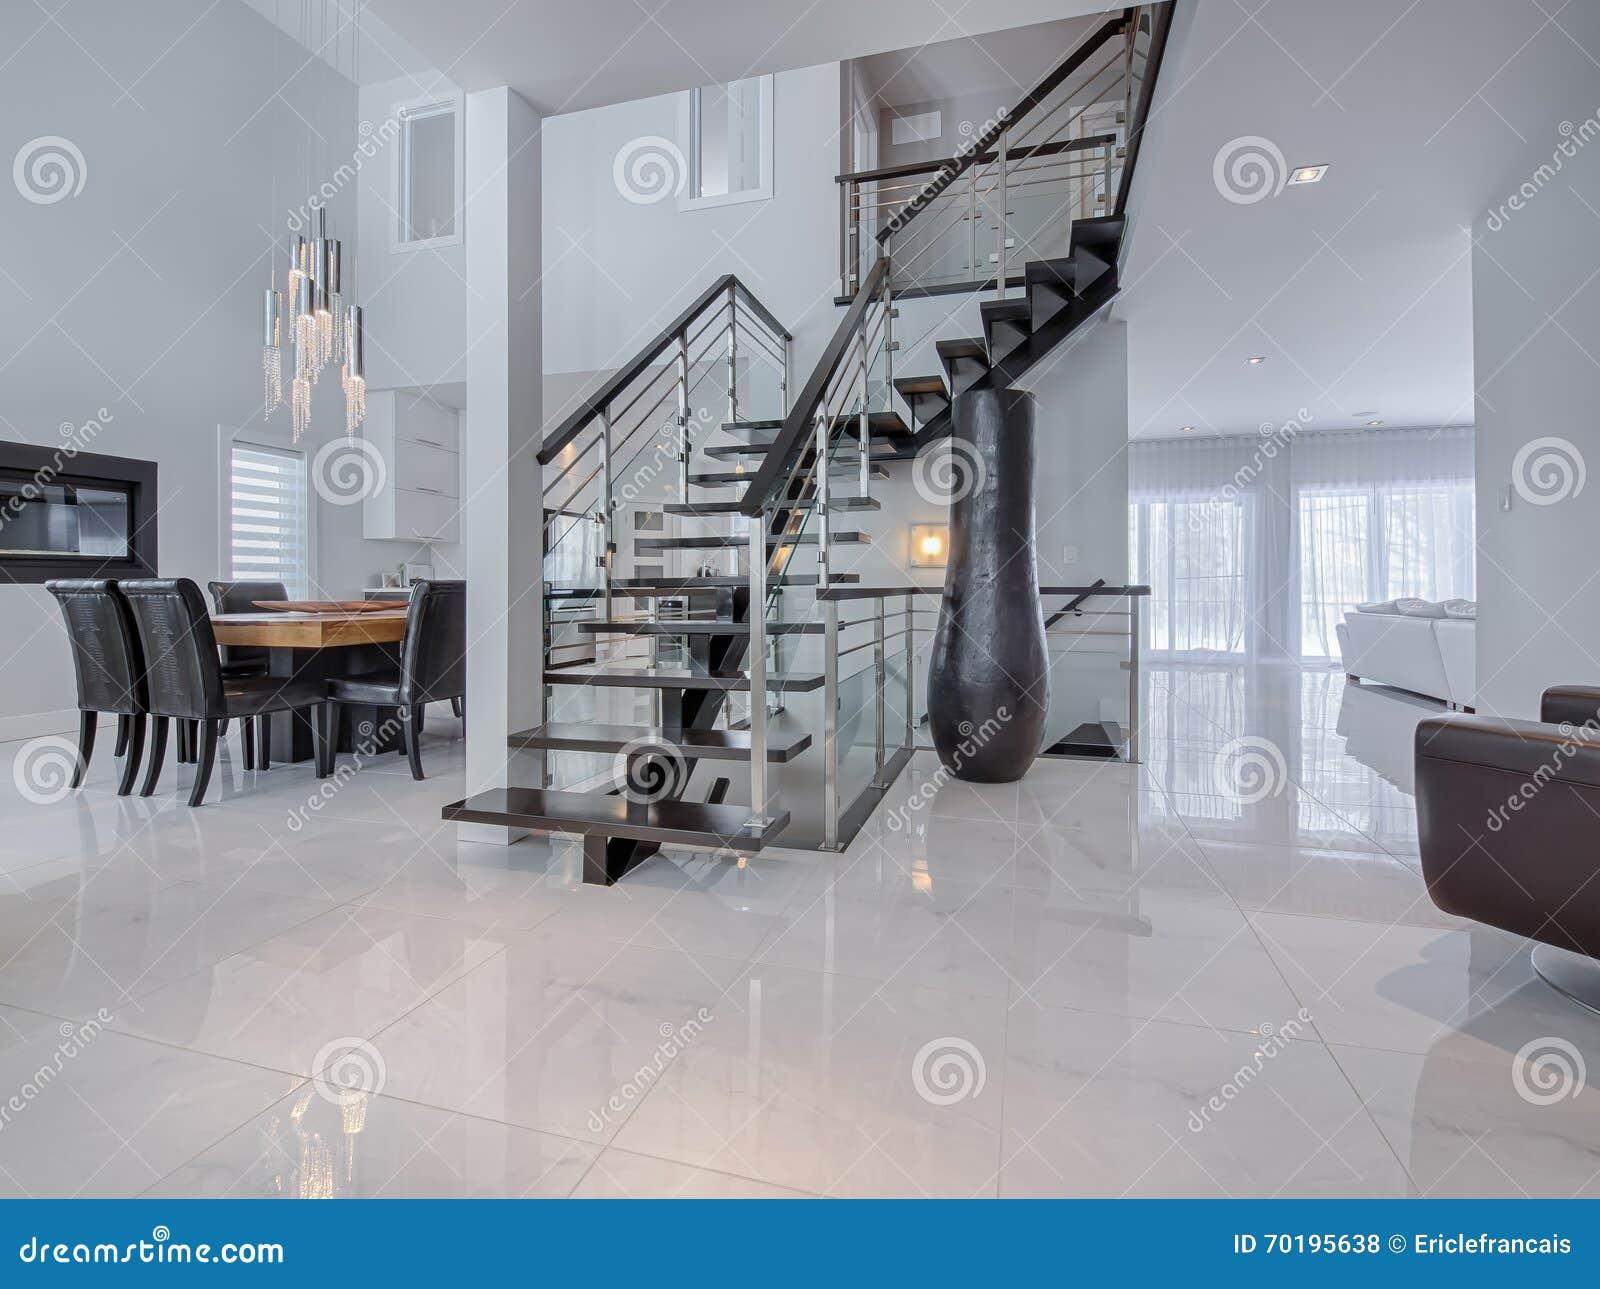 moderne treppe auf marmorb den im haus stockfoto bild. Black Bedroom Furniture Sets. Home Design Ideas